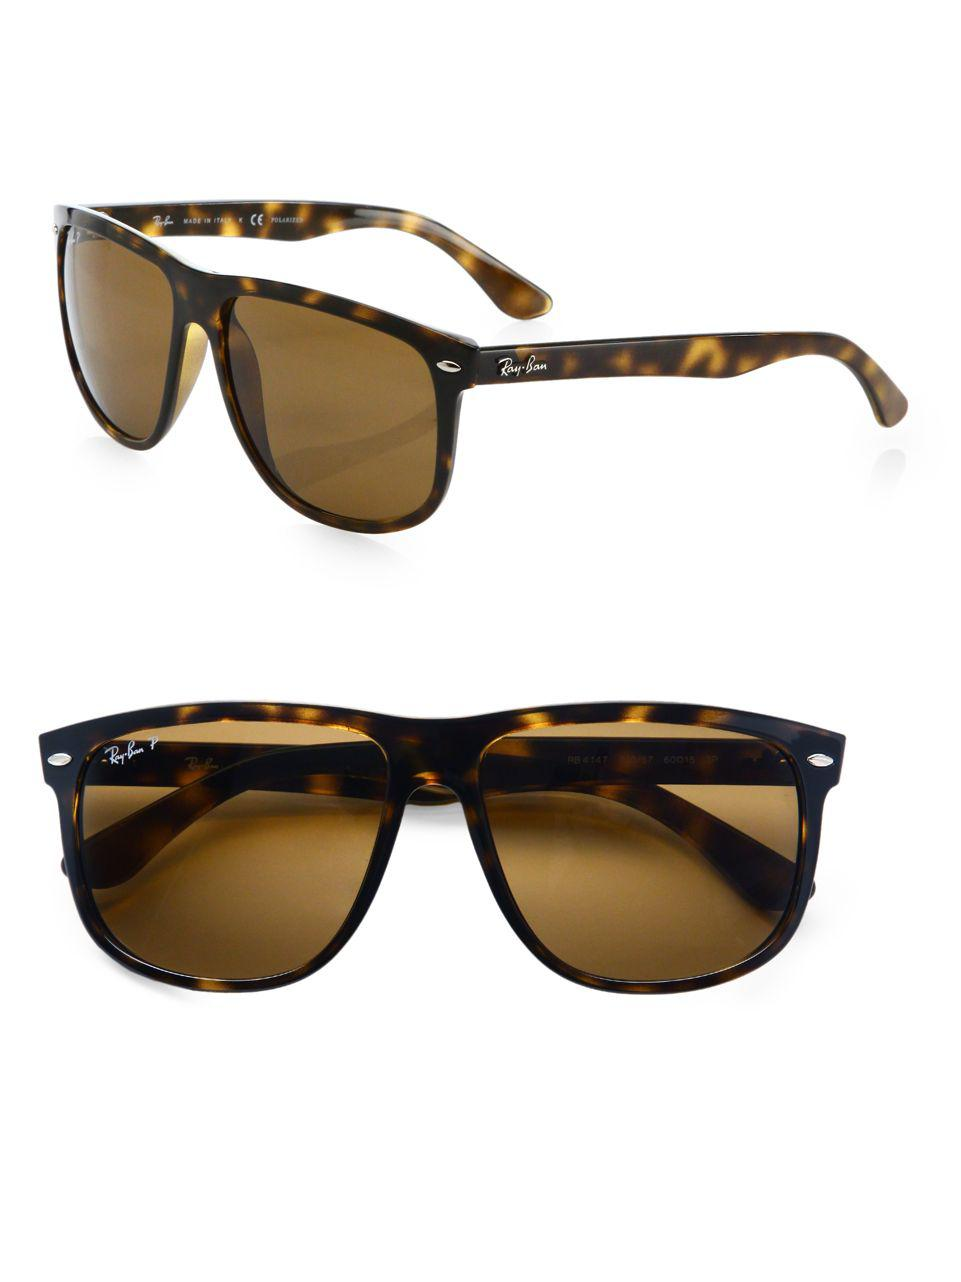 ace11e73b0 Lyst - Ray-Ban 60mm Flat-top Boyfriend Wayfarer Sunglasses